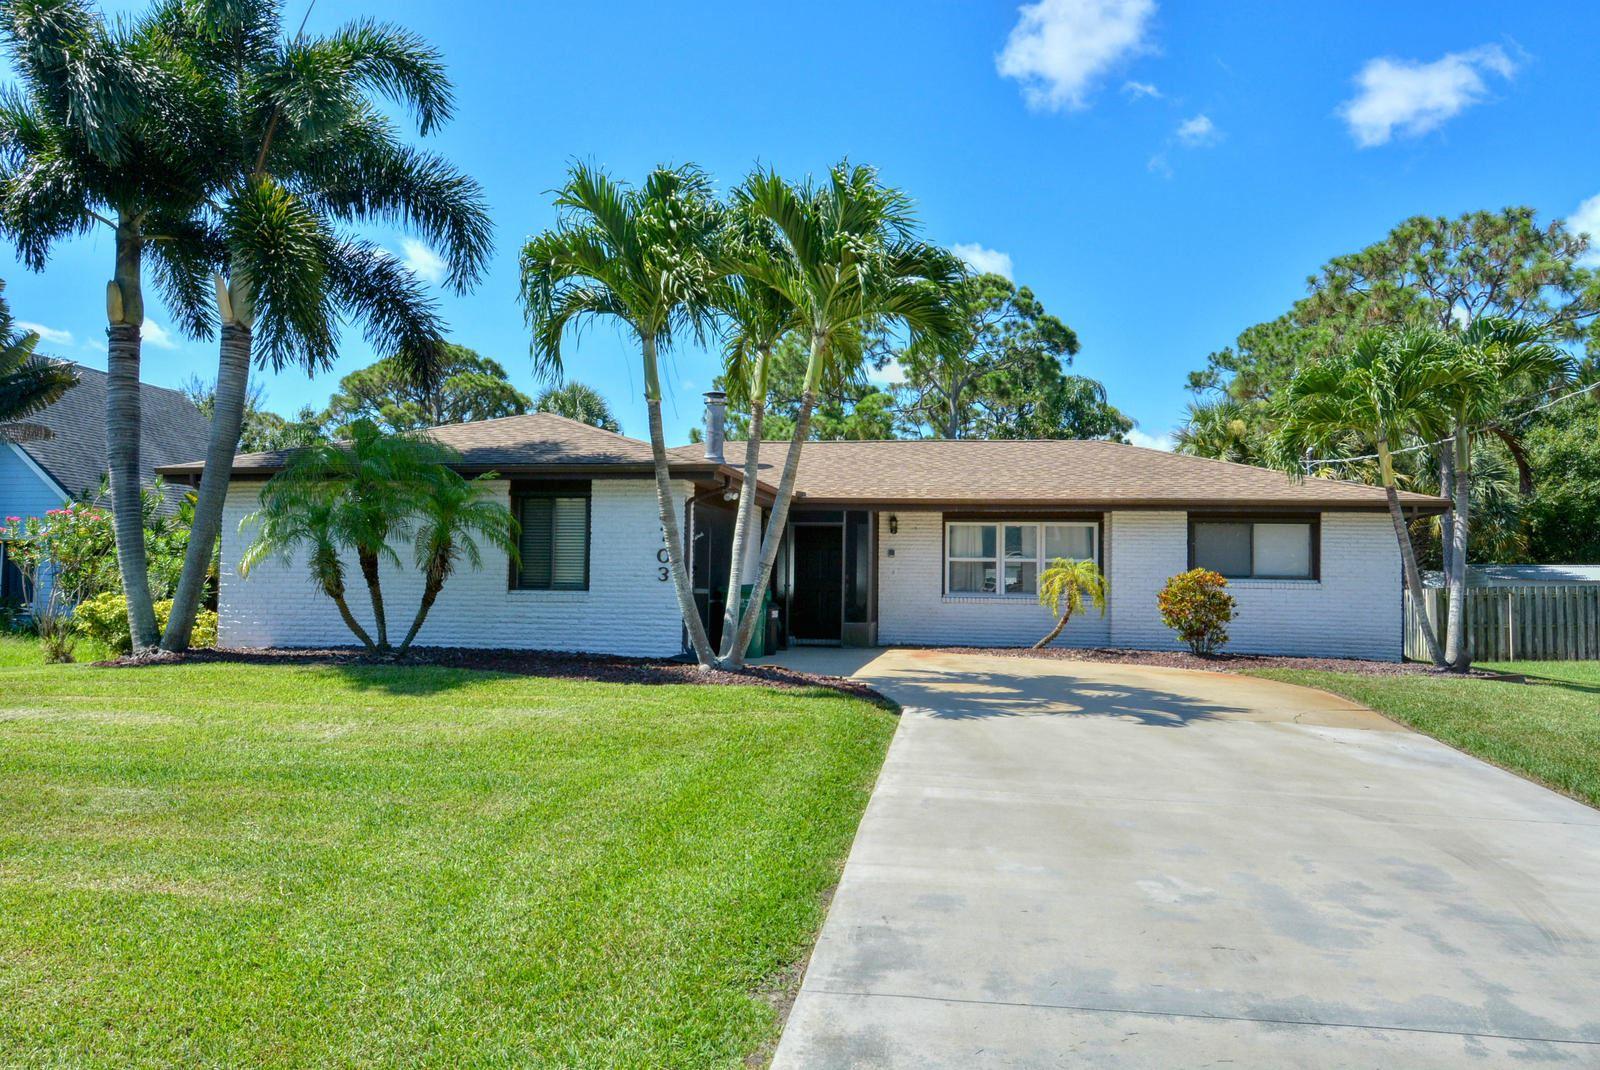 5703 Papaya Drive, Fort Pierce, FL 34982 - #: RX-10633430